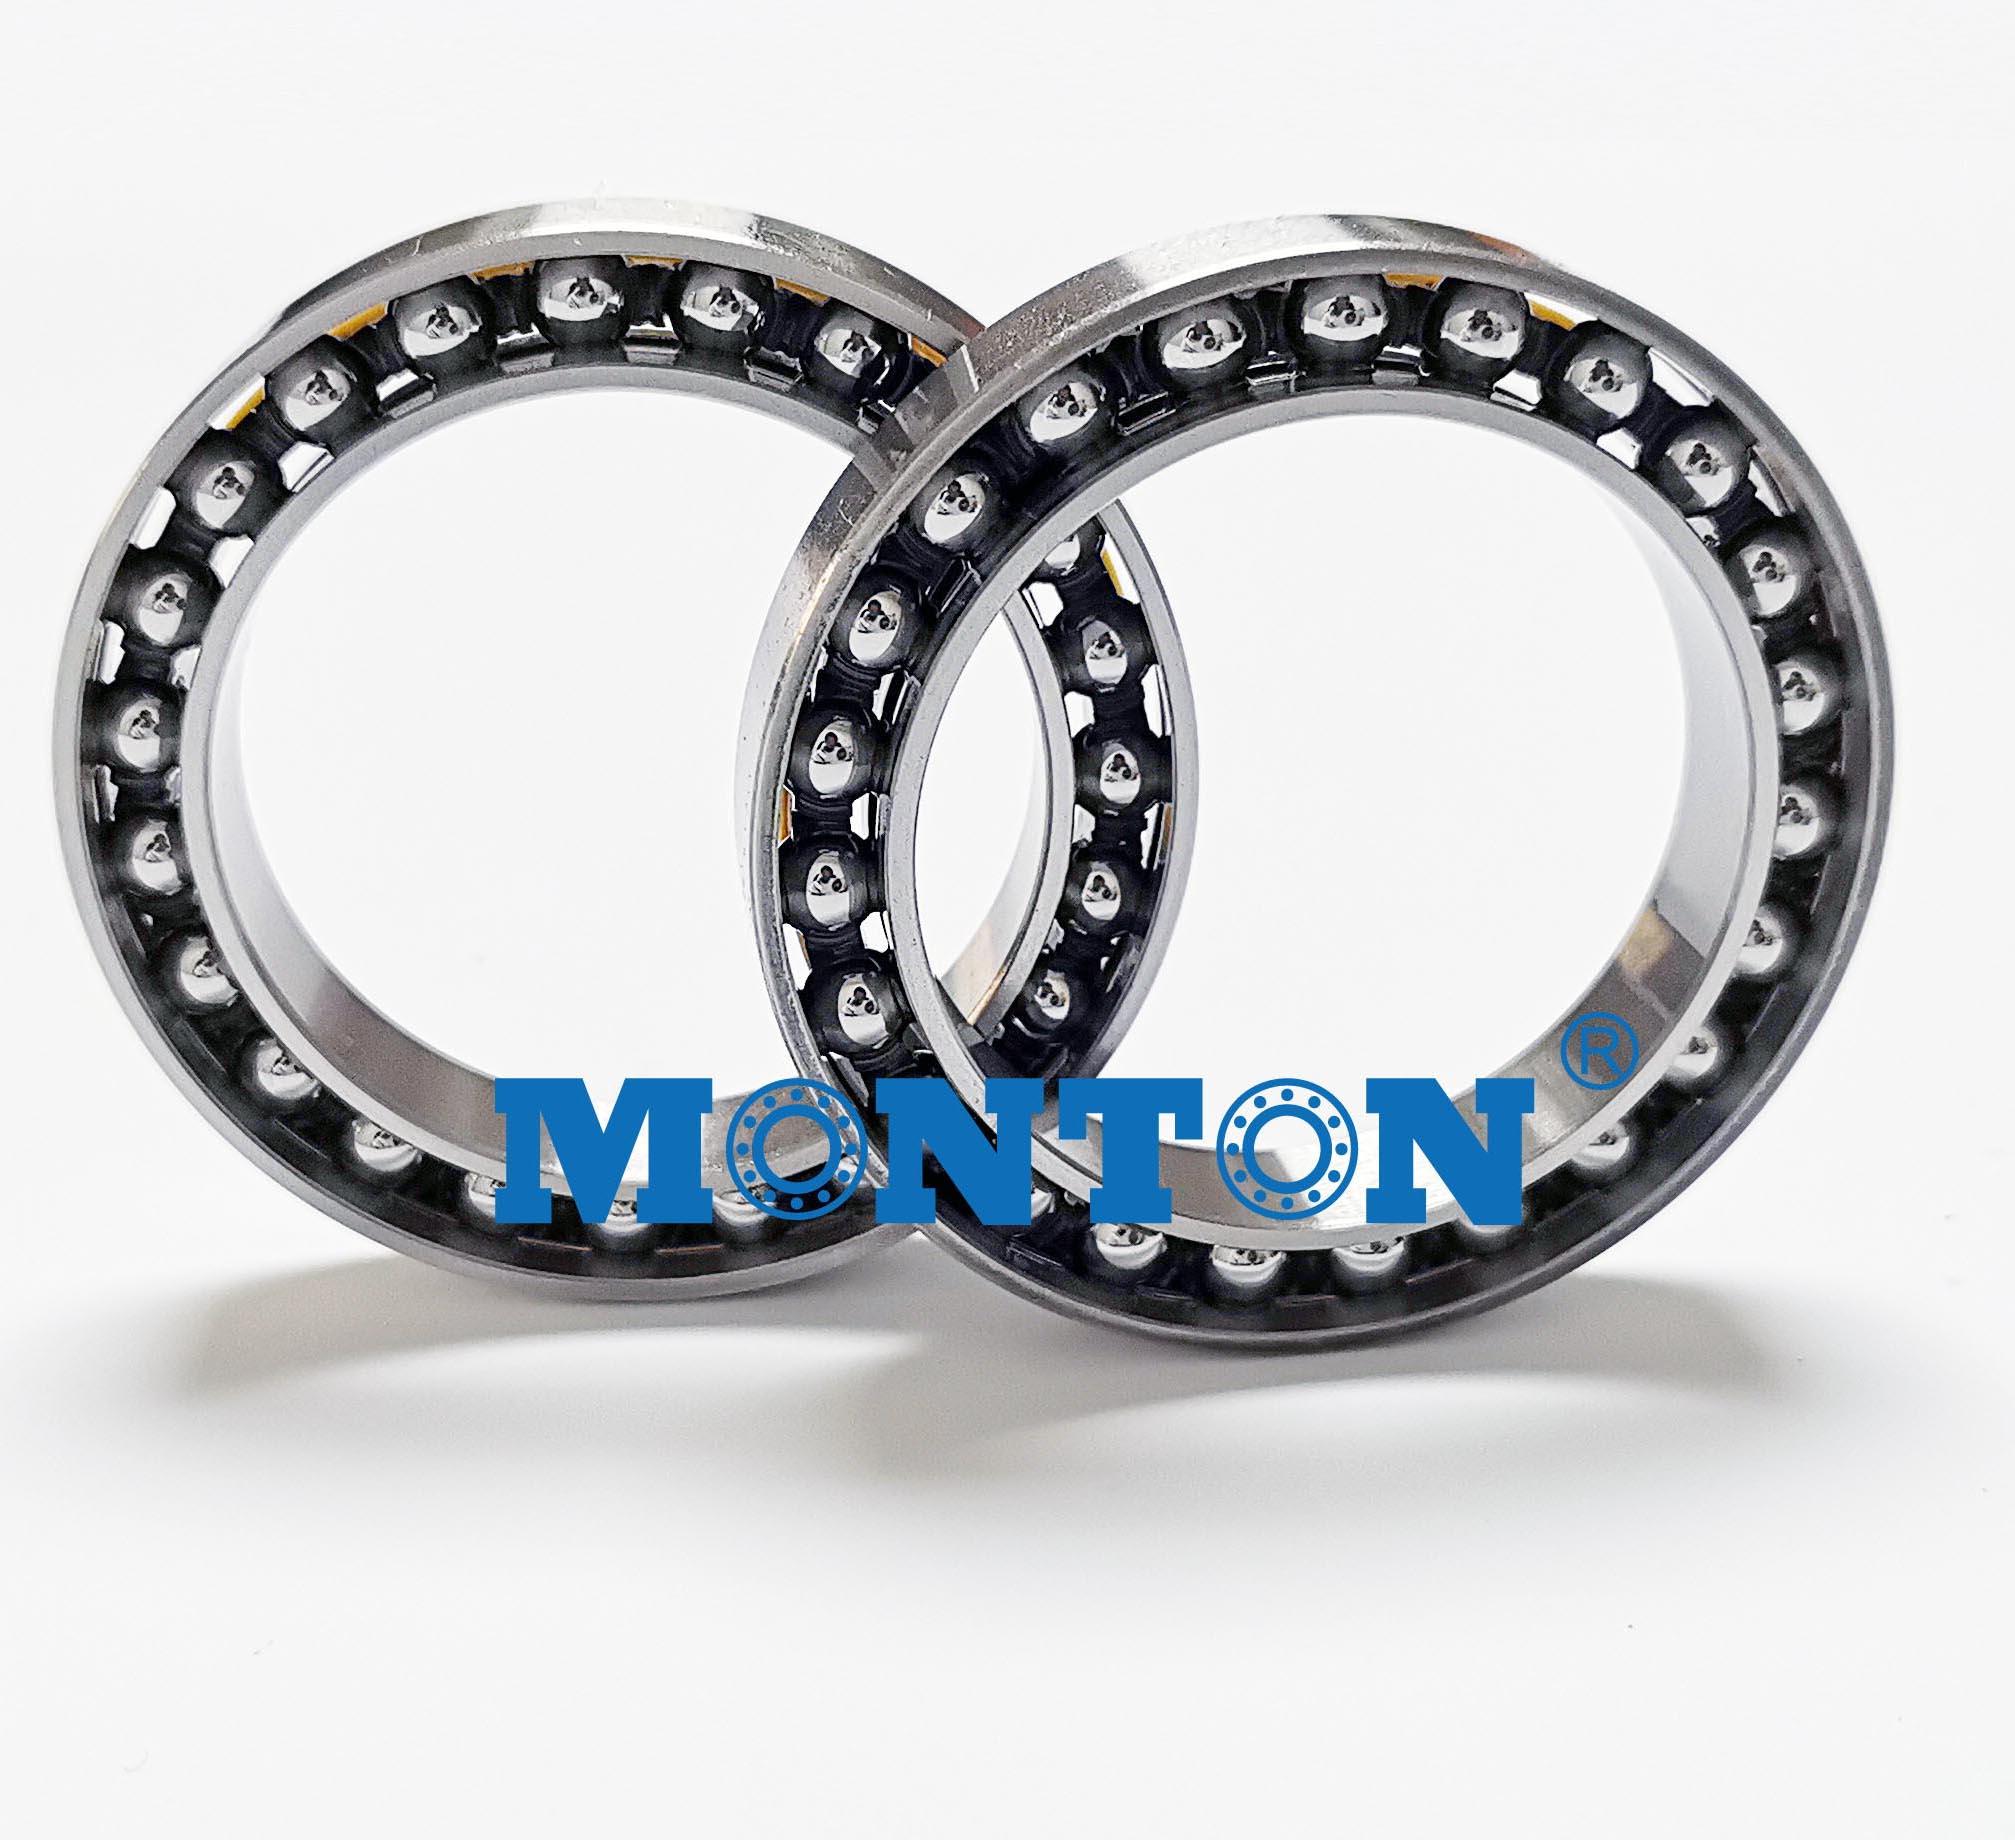 F20 35.56*49.073*7.24mm flexible bearing for harmonic drive strain wave gear bearing